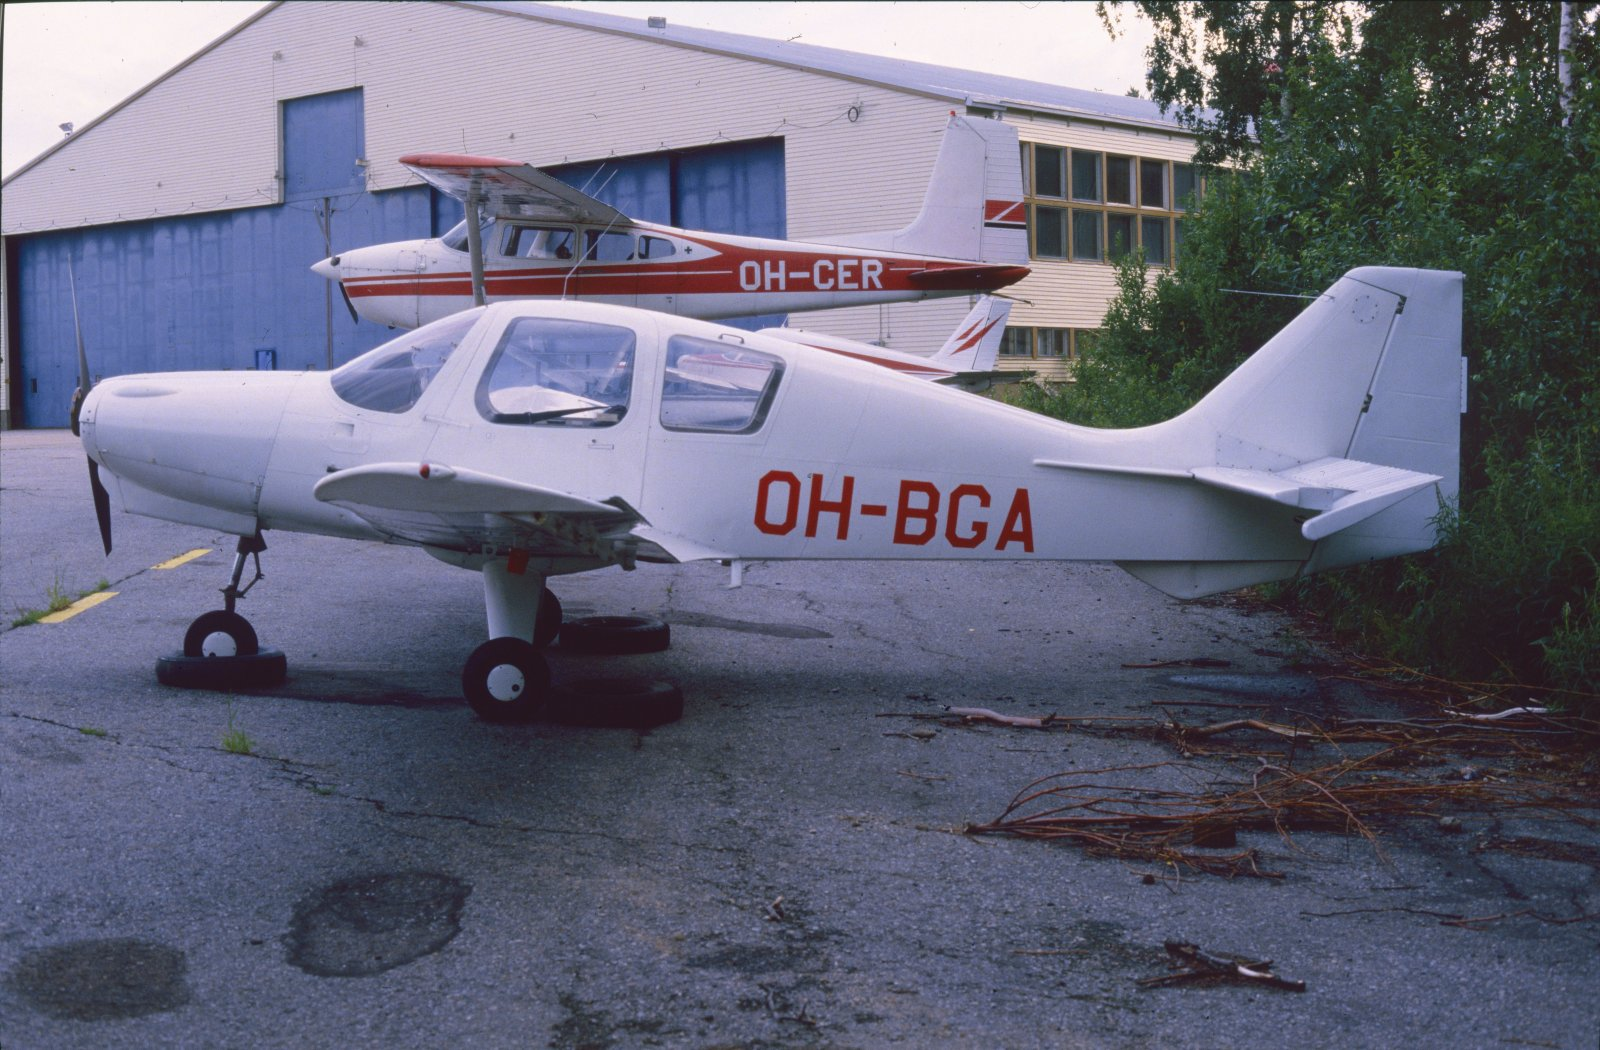 Beagle B.121 Pup Srs.1 OH-BGA EFKU 1984